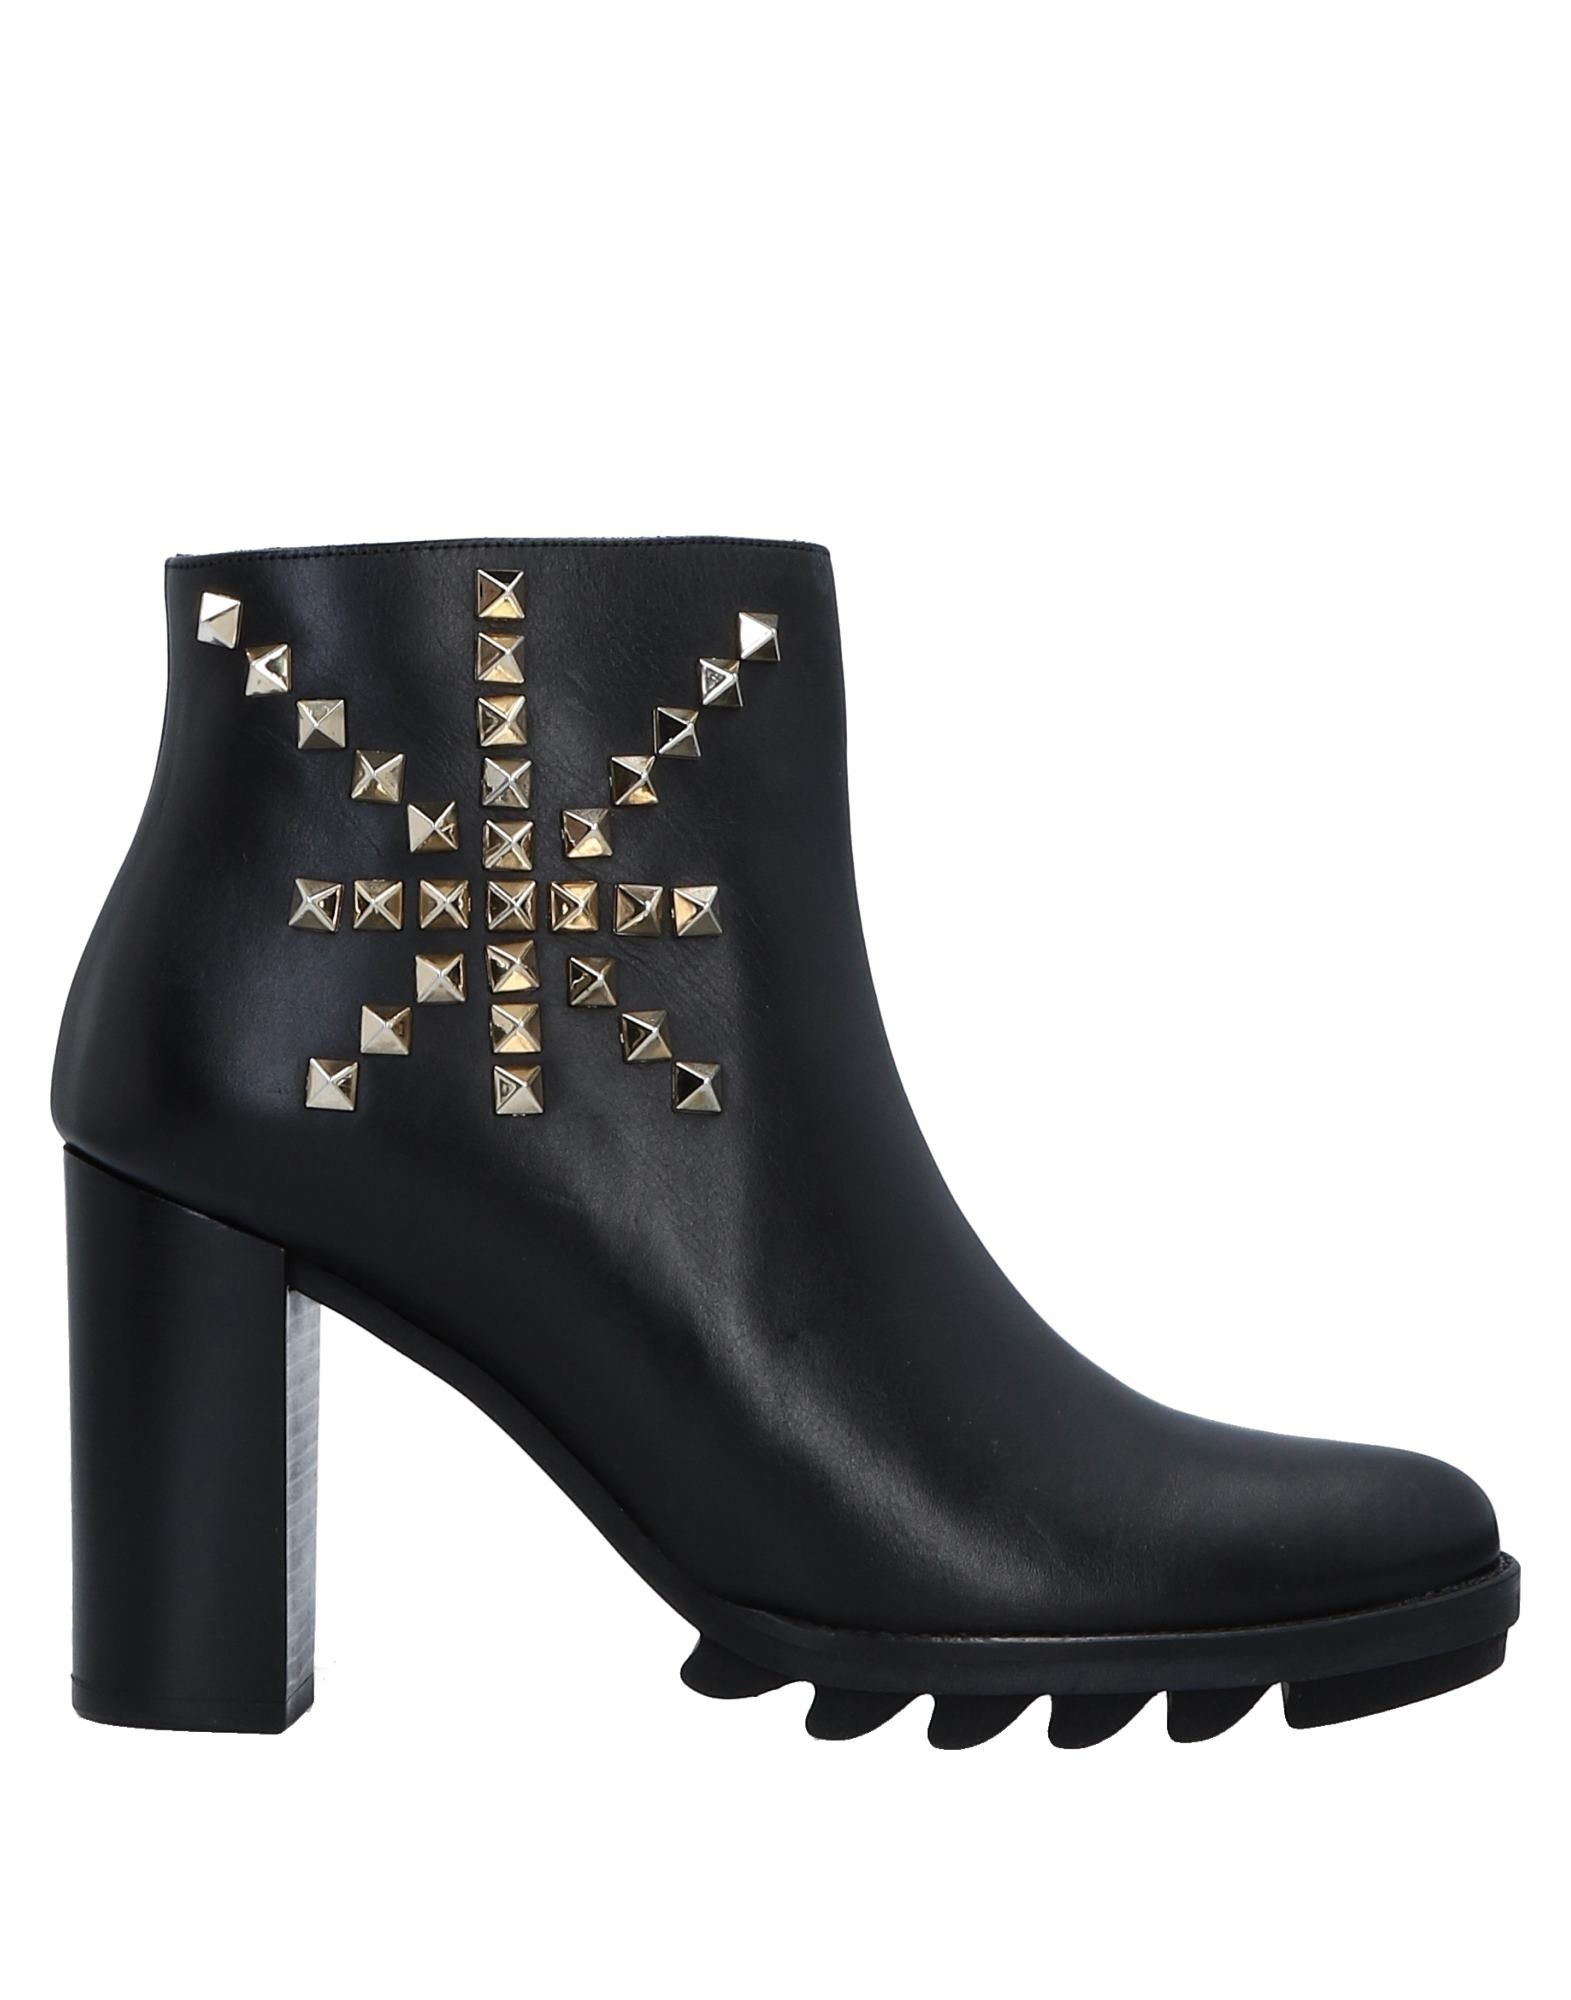 Rabatt Schuhe Ursula Mascaro' Stiefelette Damen  11514648SX